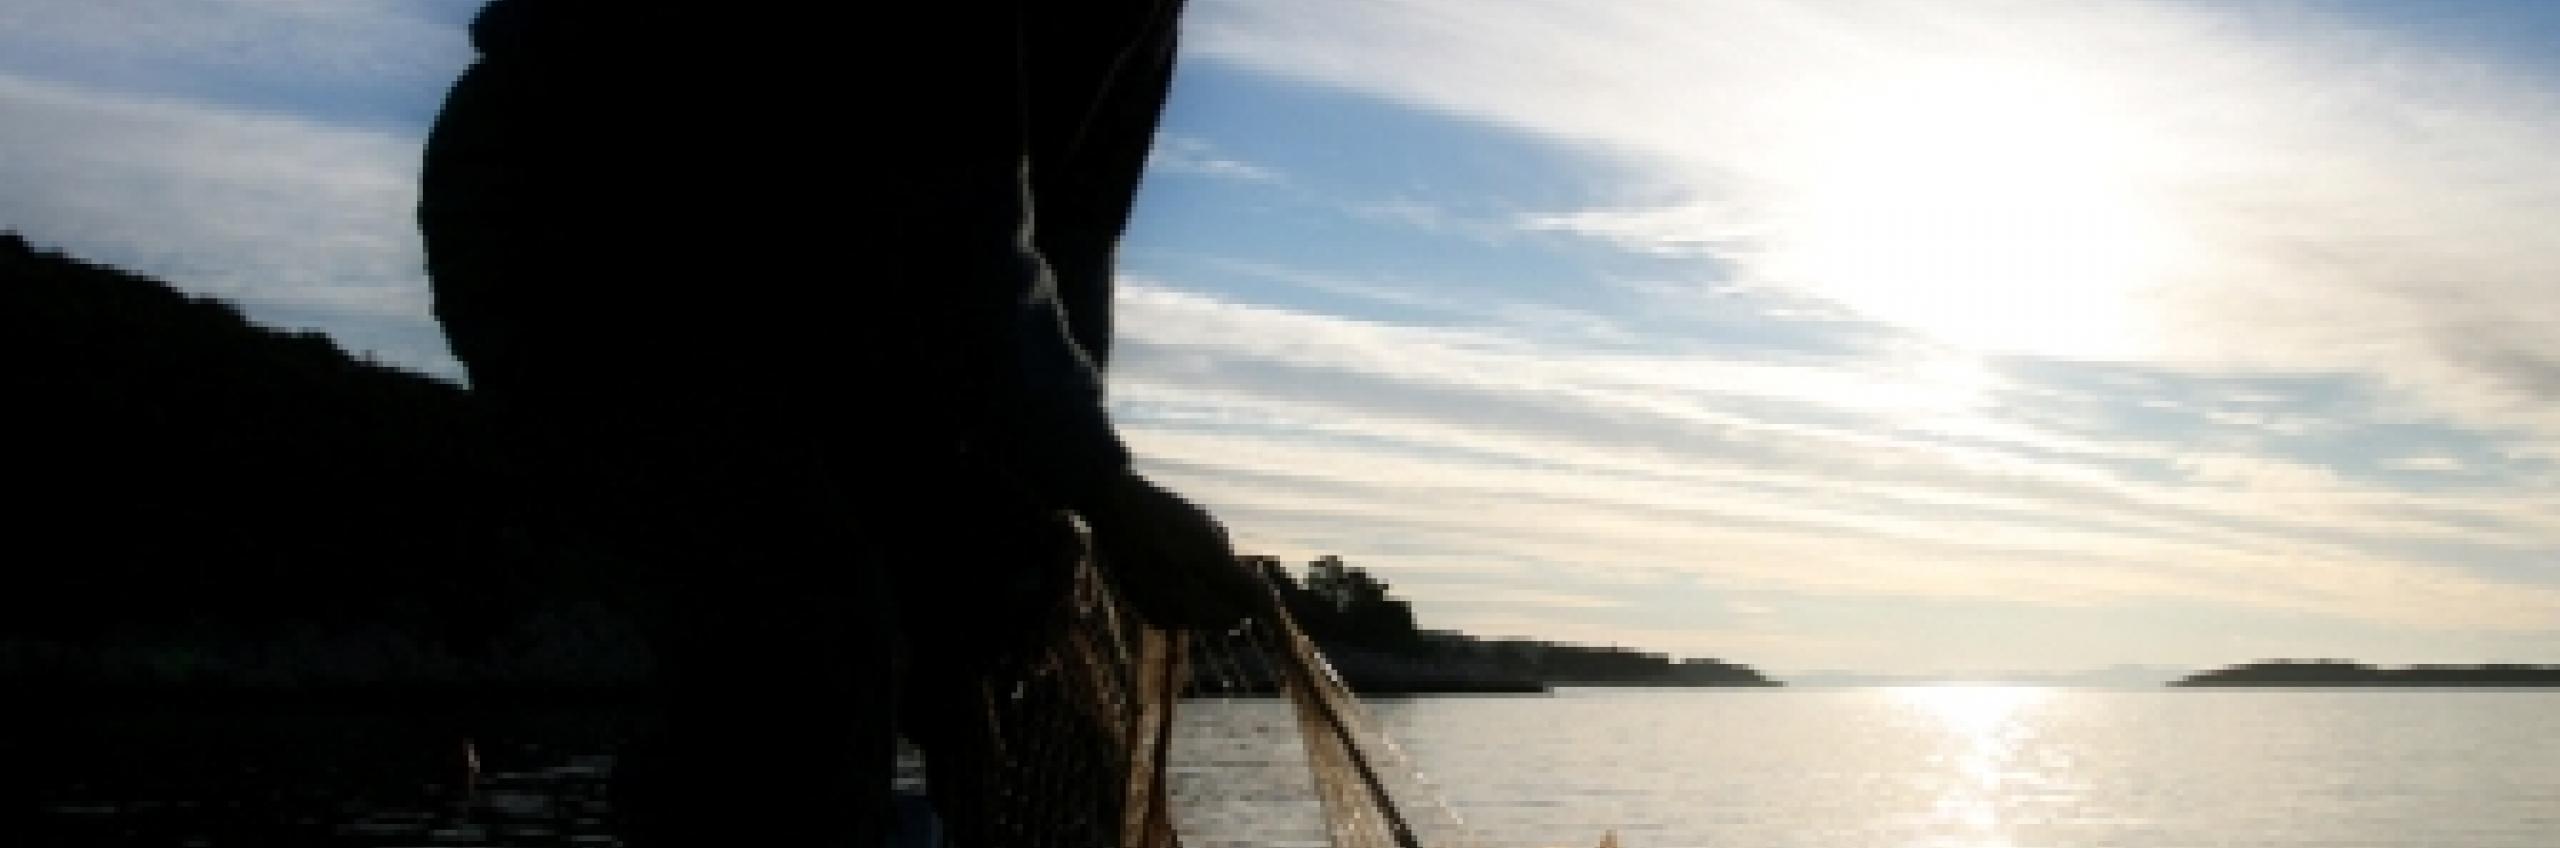 Fishing...where man meets the sea